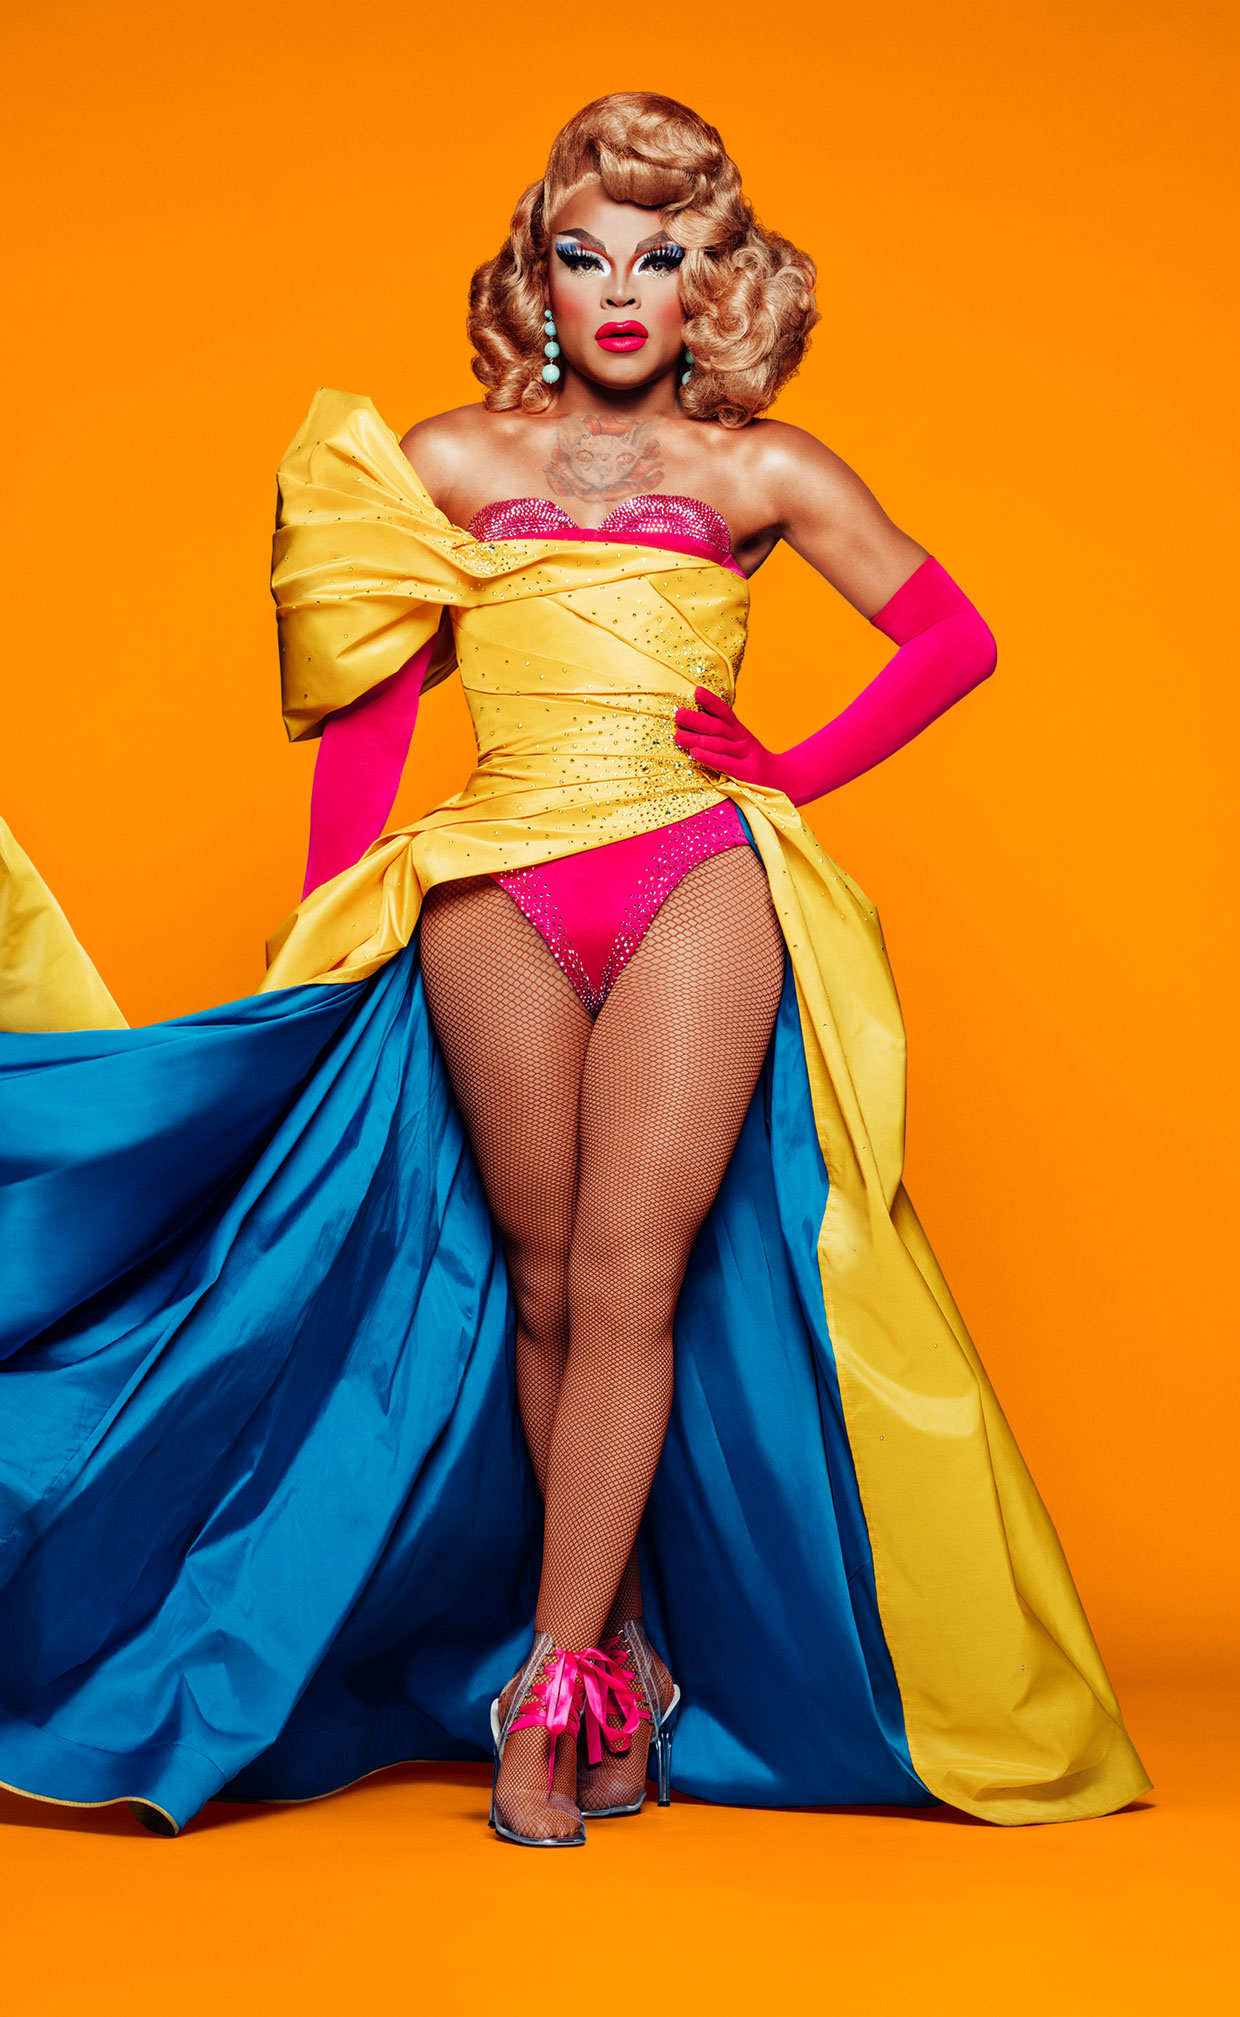 Vanessa-Vanjie-Mateo-rupaul-season-11-a-billboard-1240.jpg